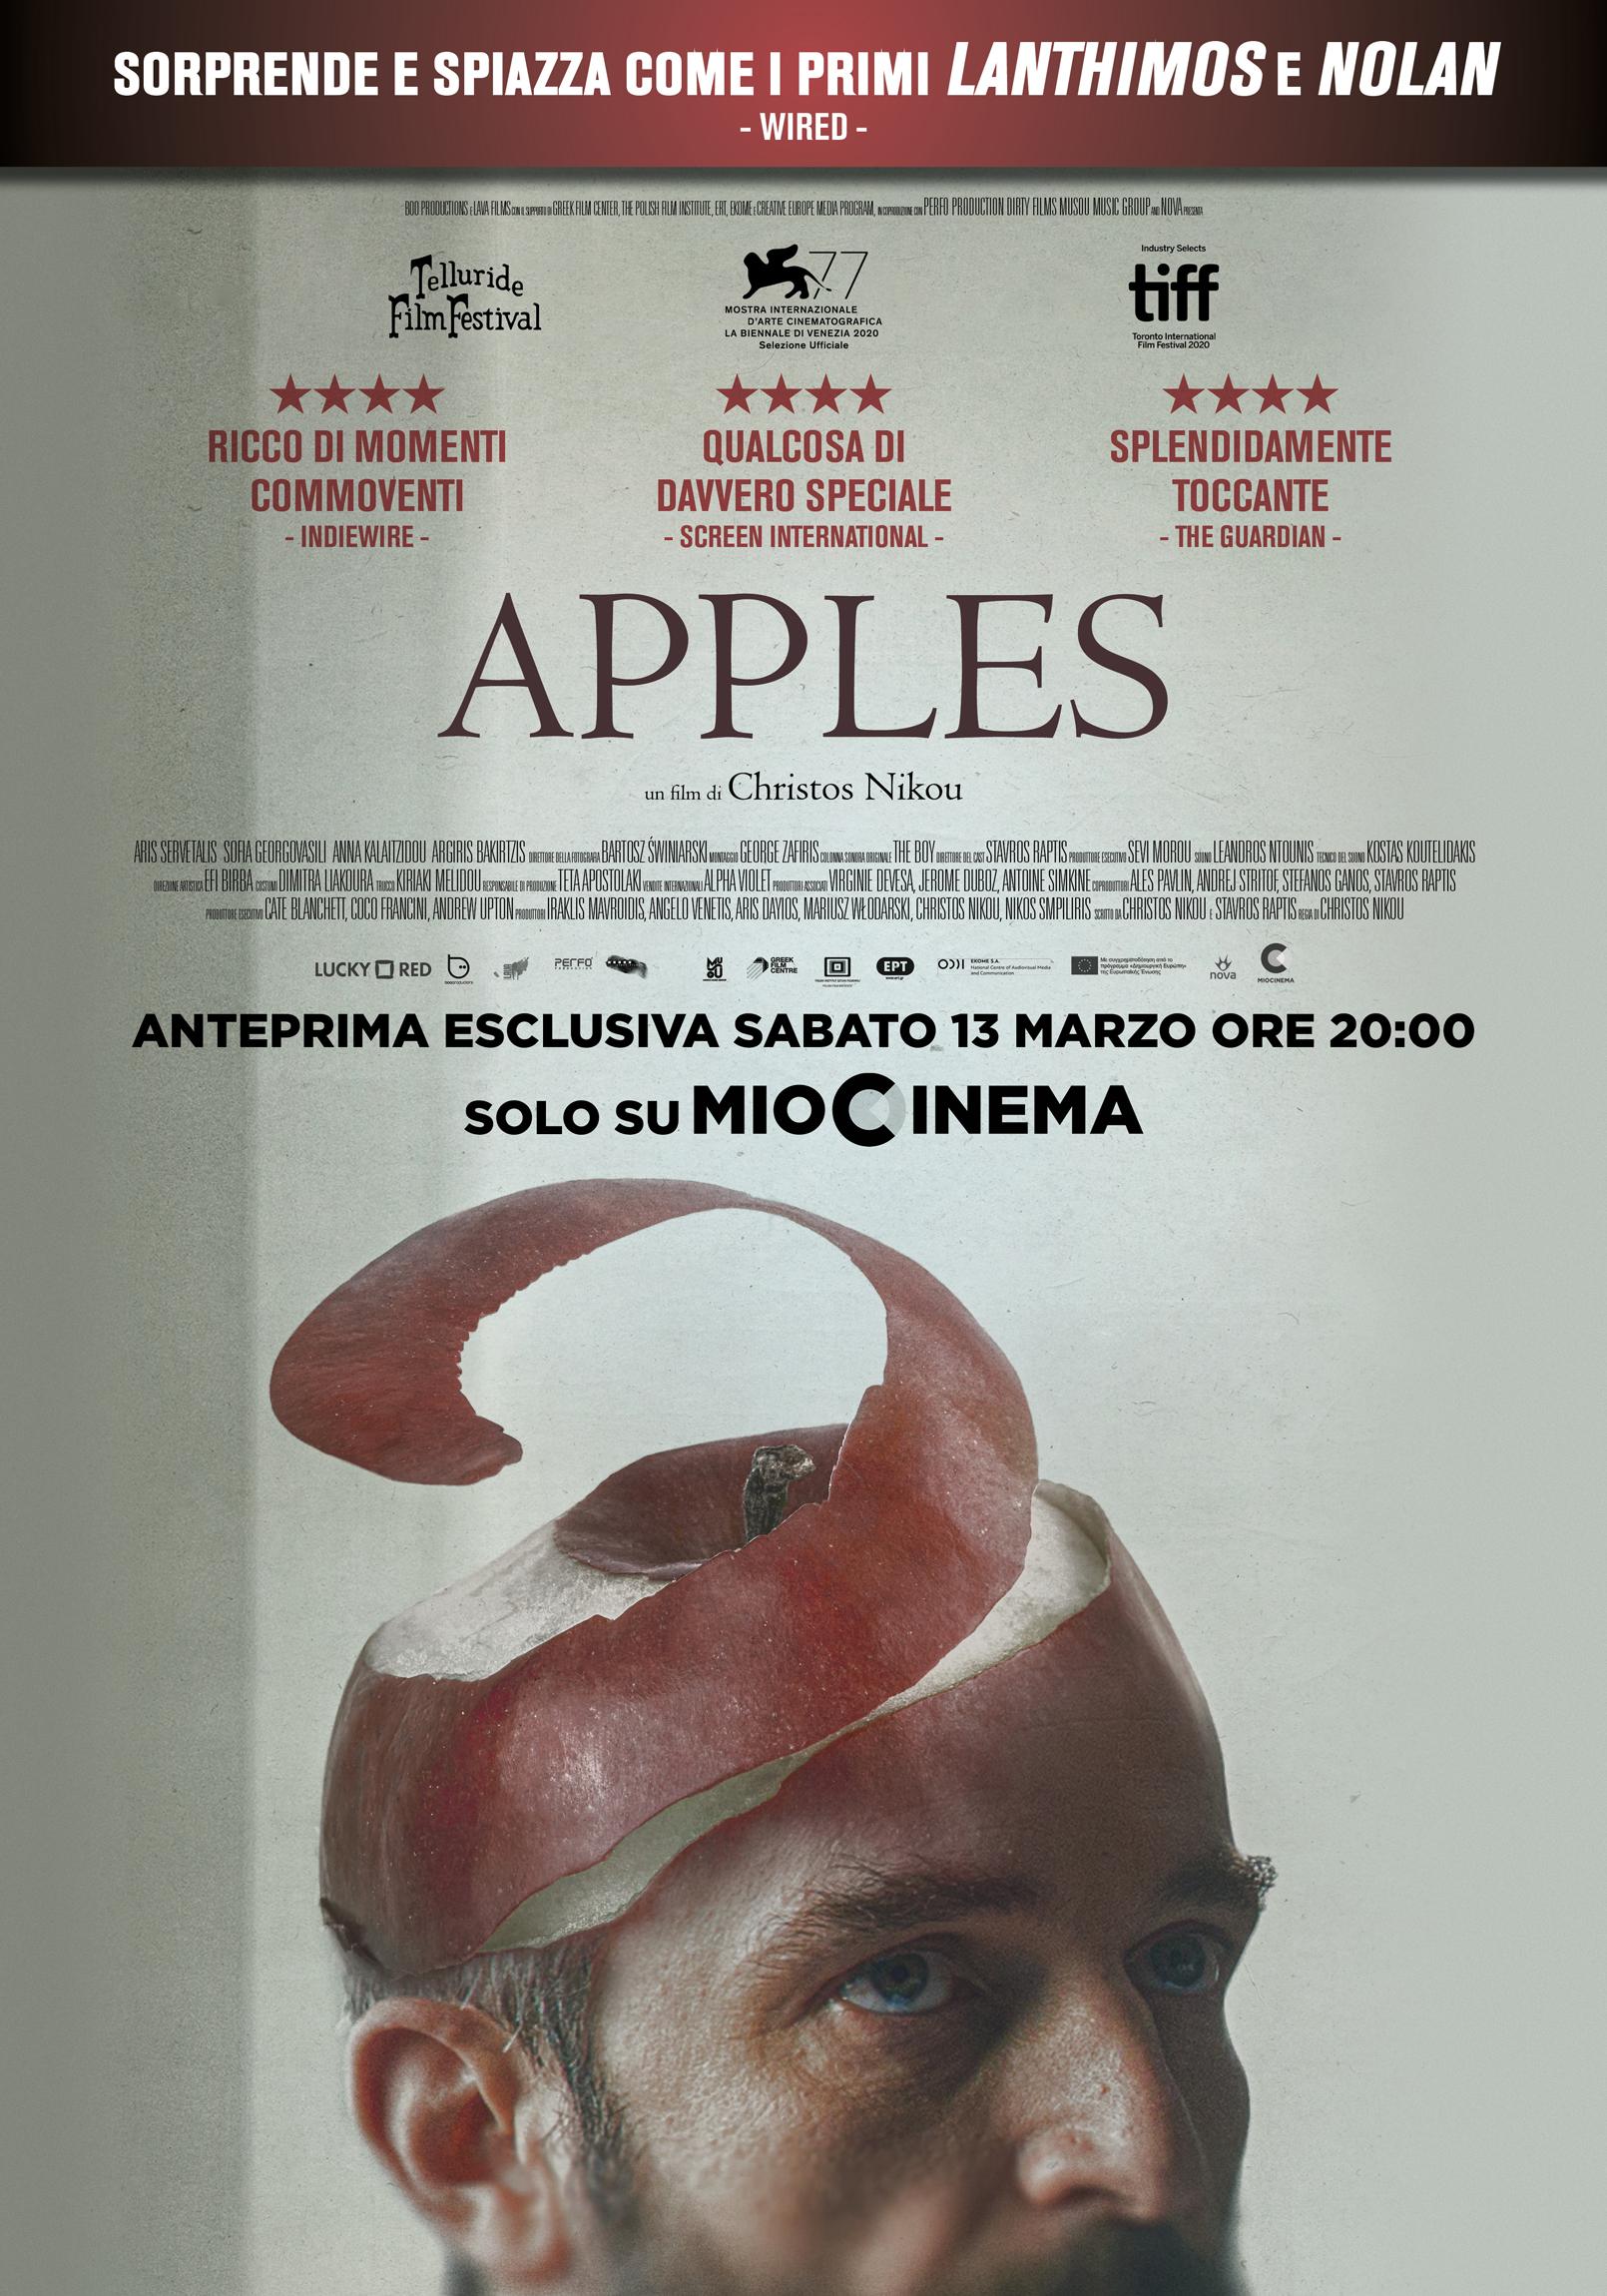 ANTEPRIMA: Apples